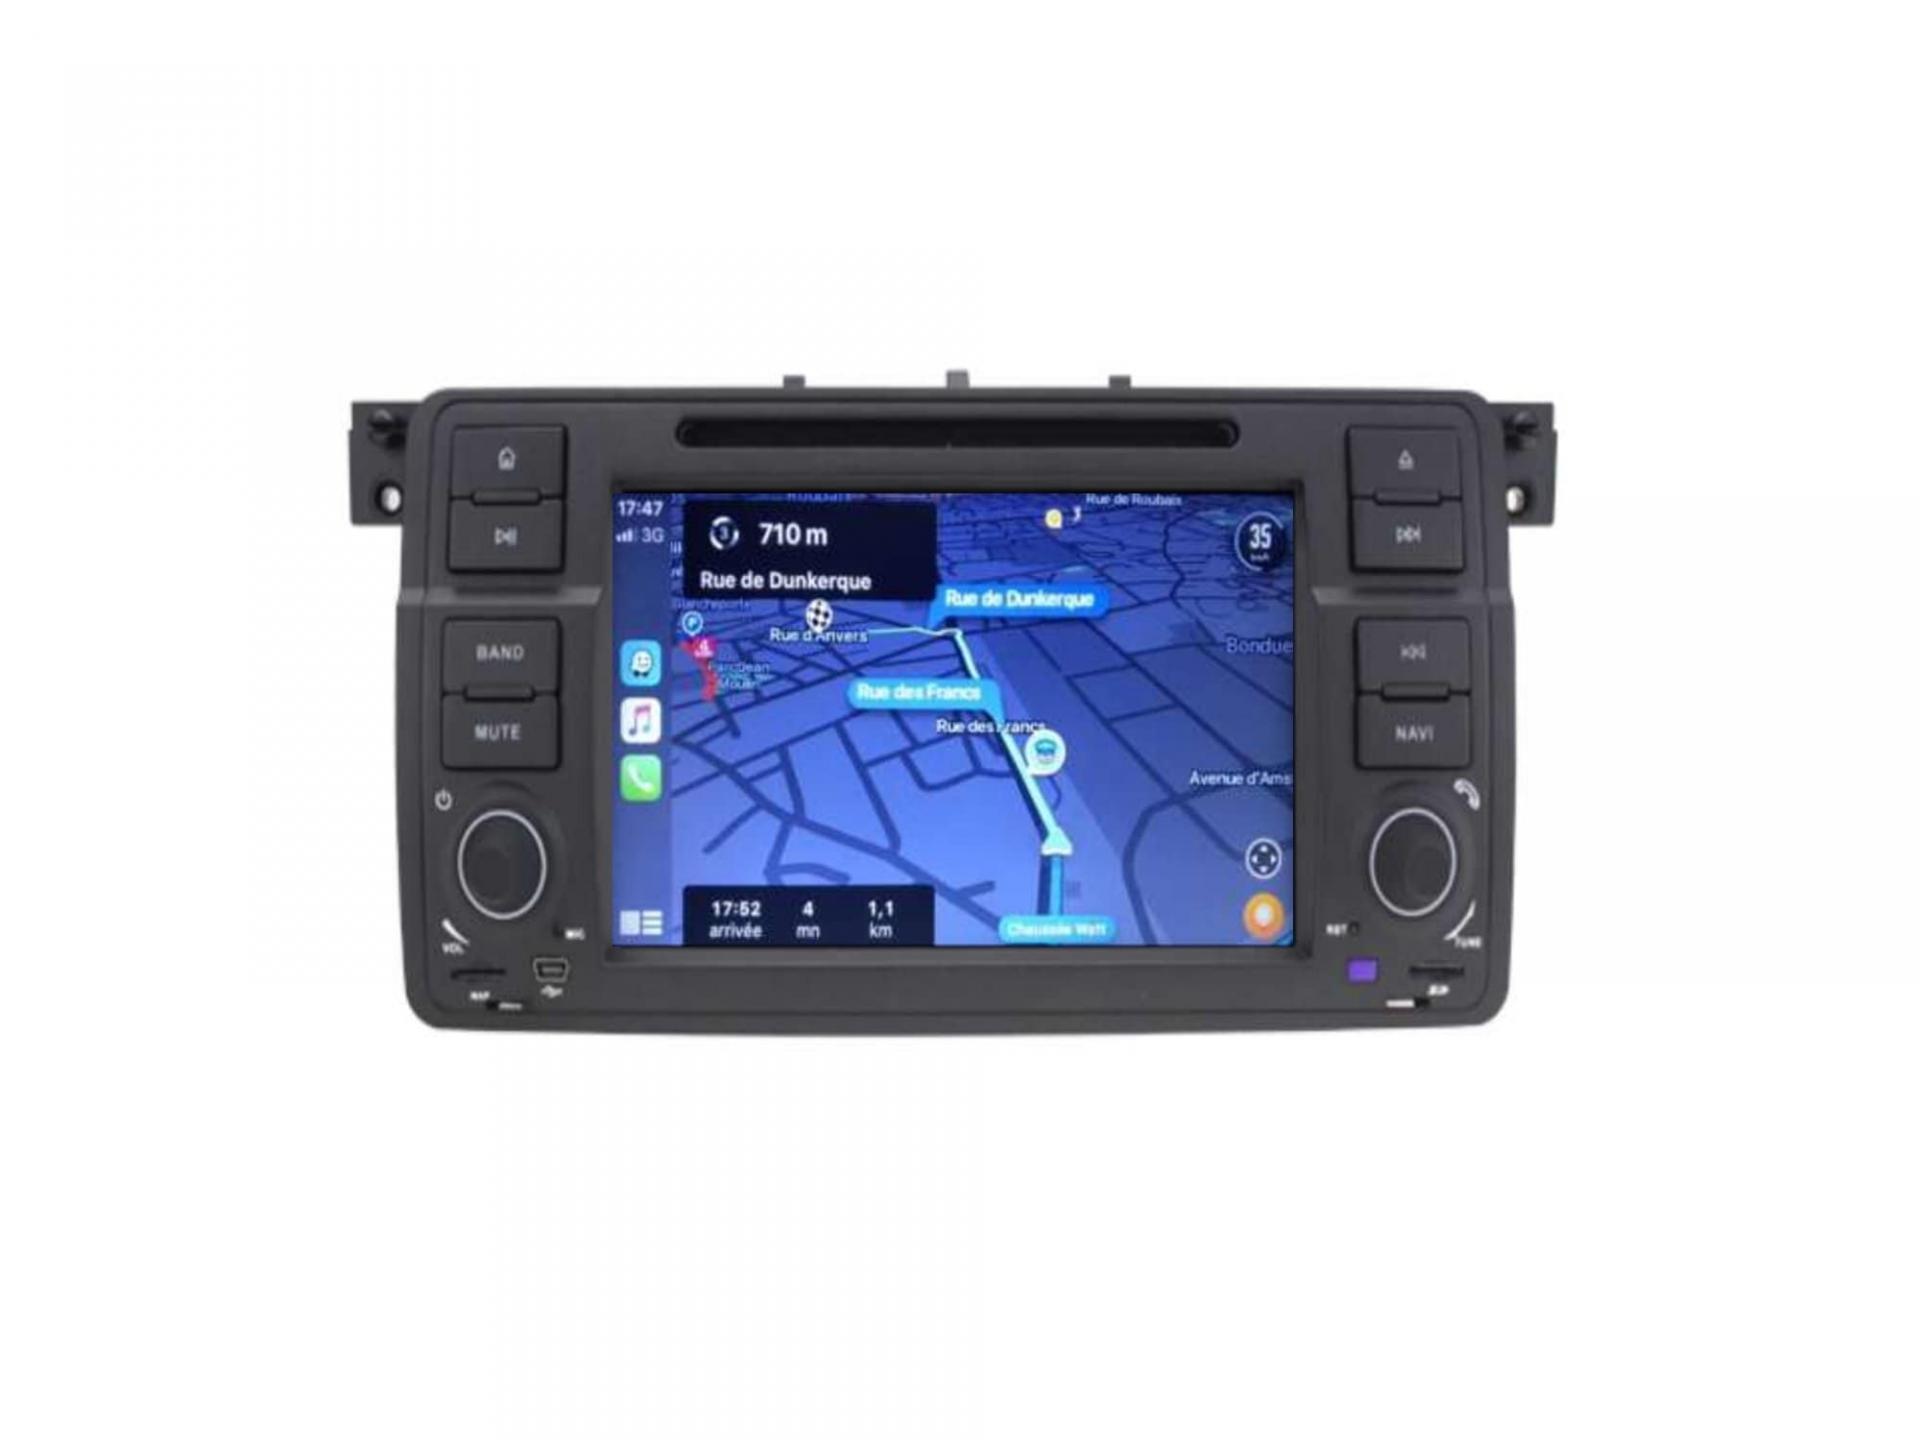 Autoradio gps carplay android auto bluetooth bmw serie 3 e46 harman kardon 3